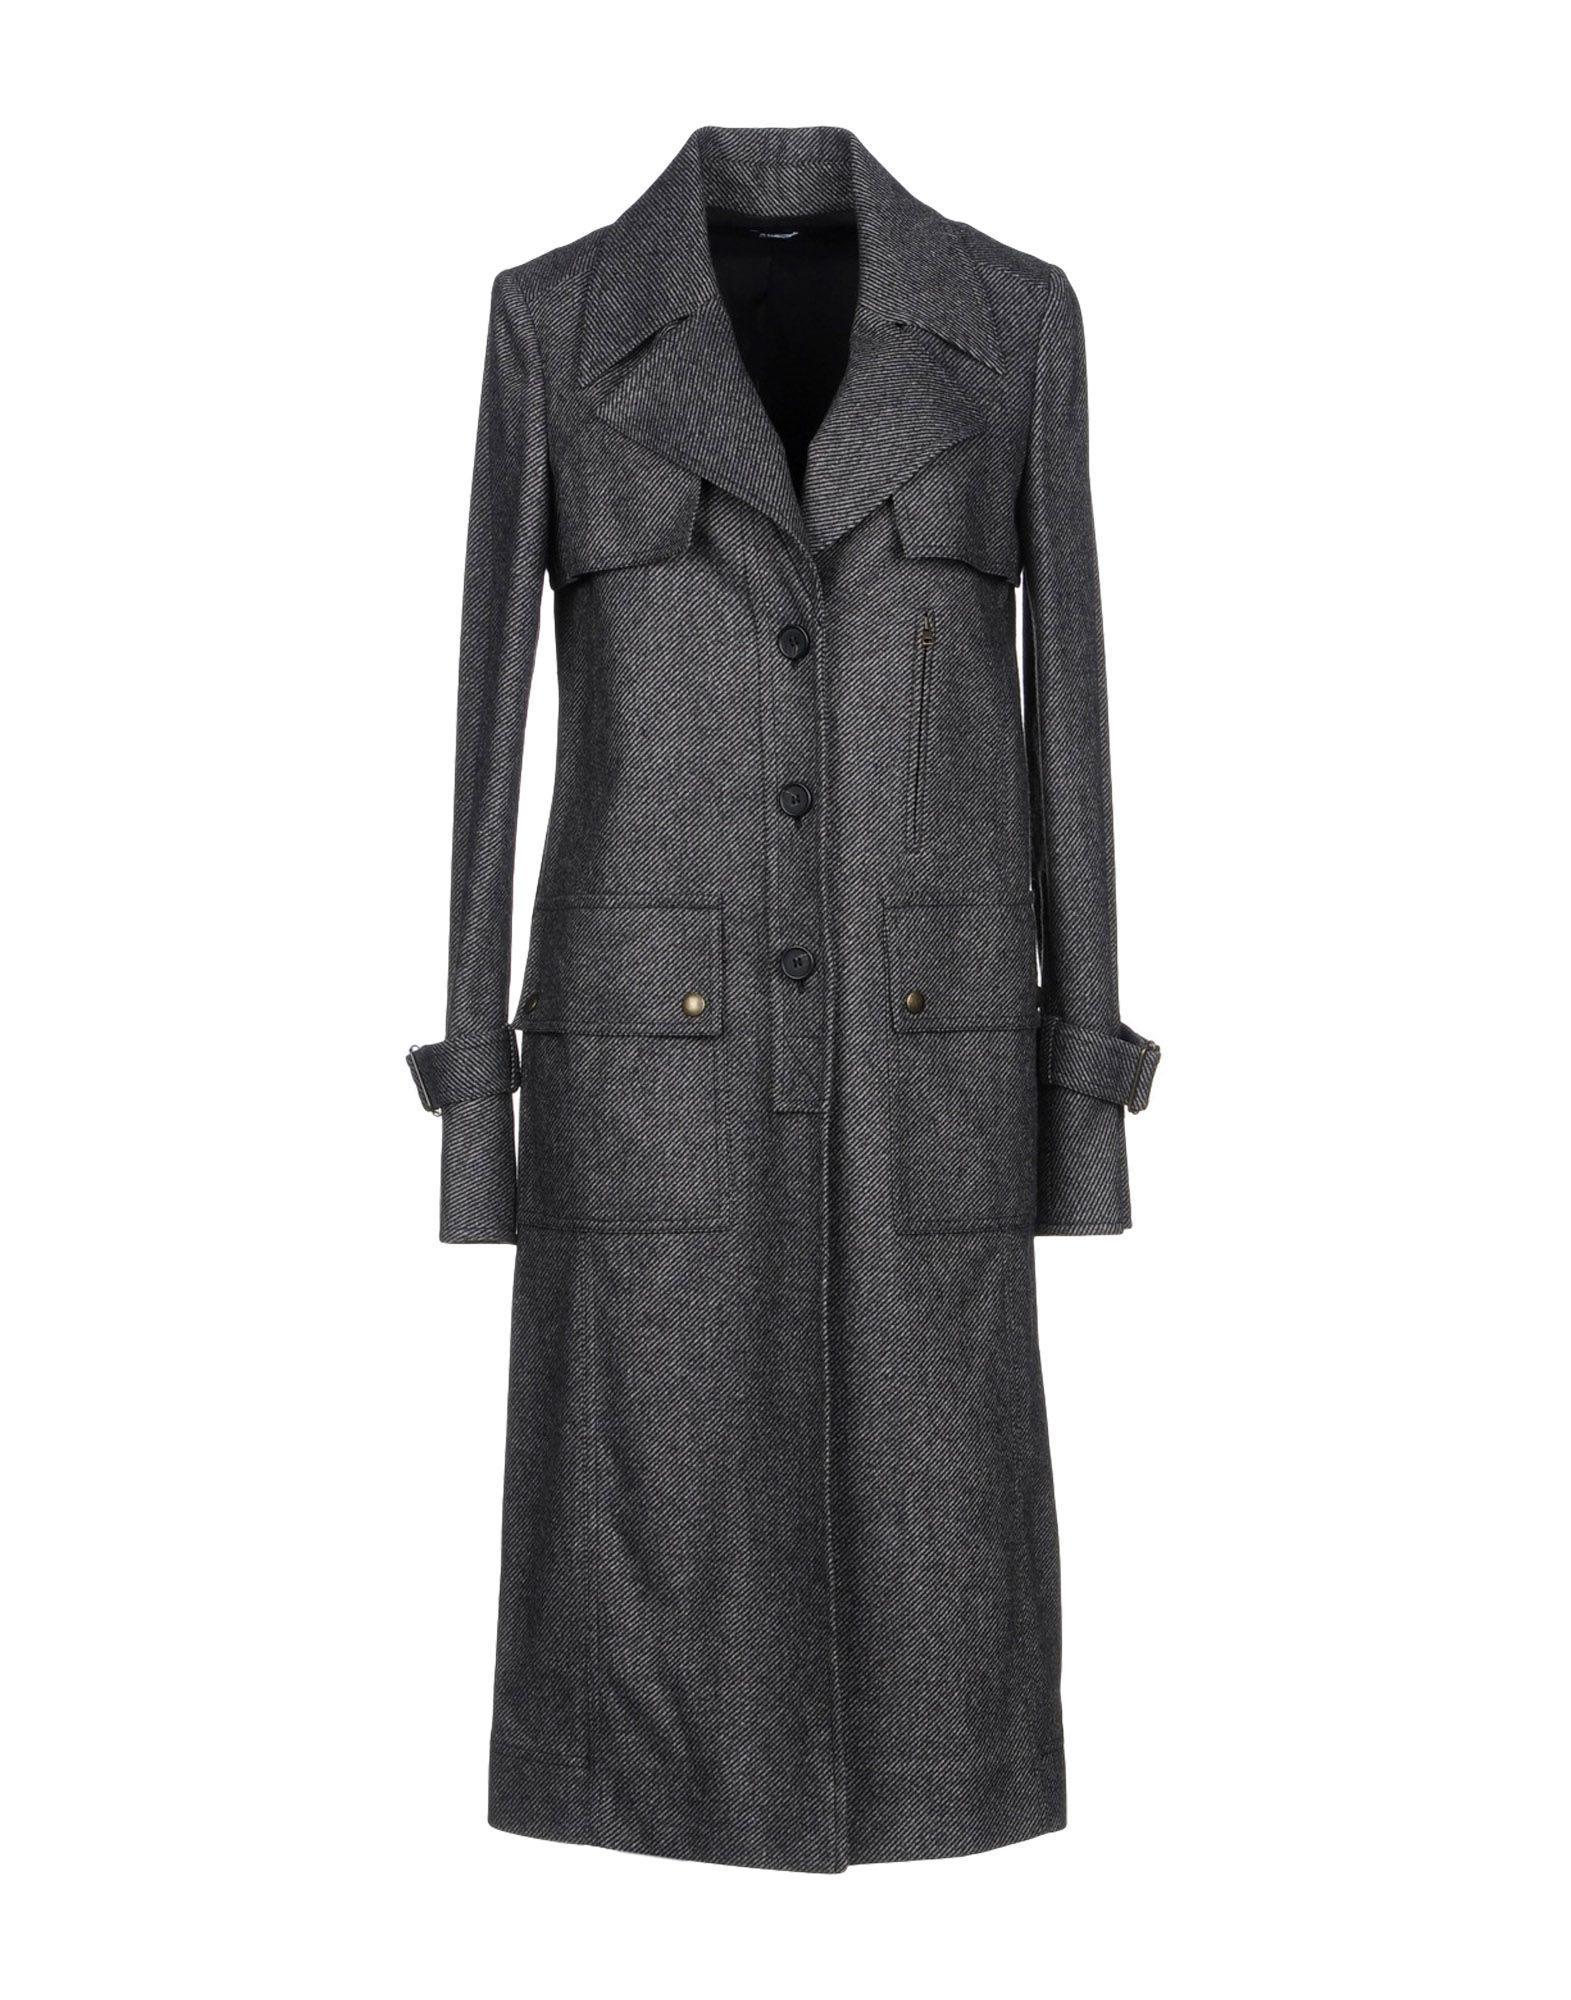 Jil Sander Full-Length Jacket In Black